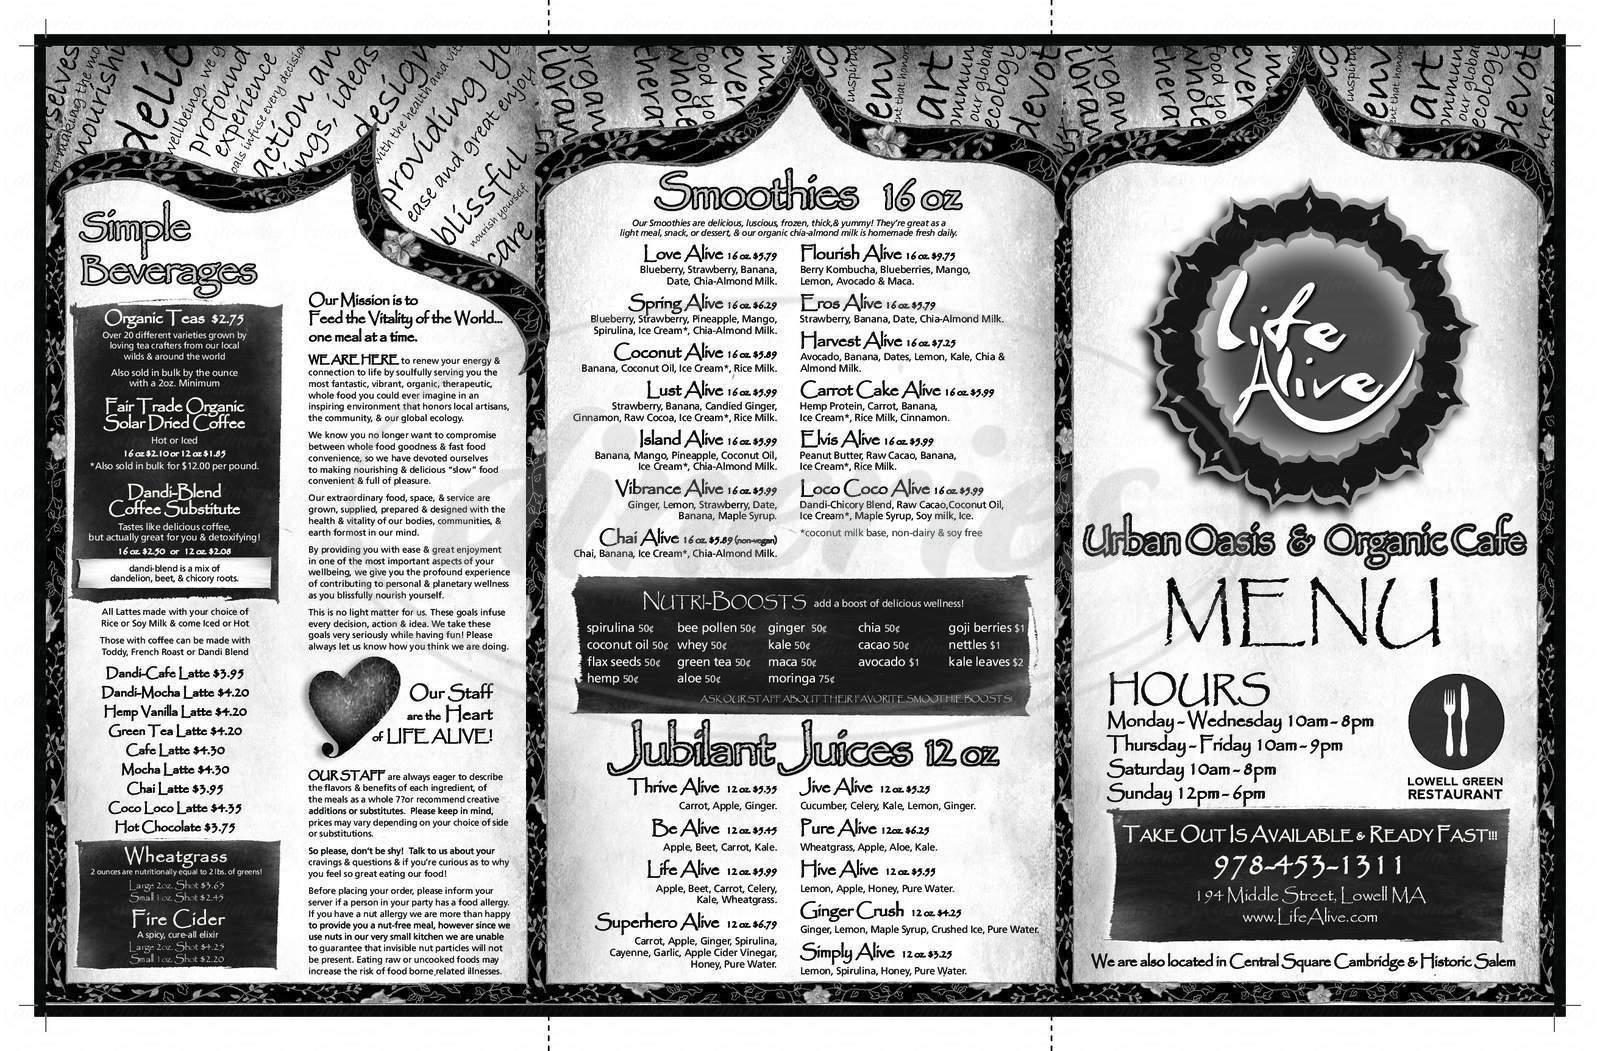 menu for Life Alive